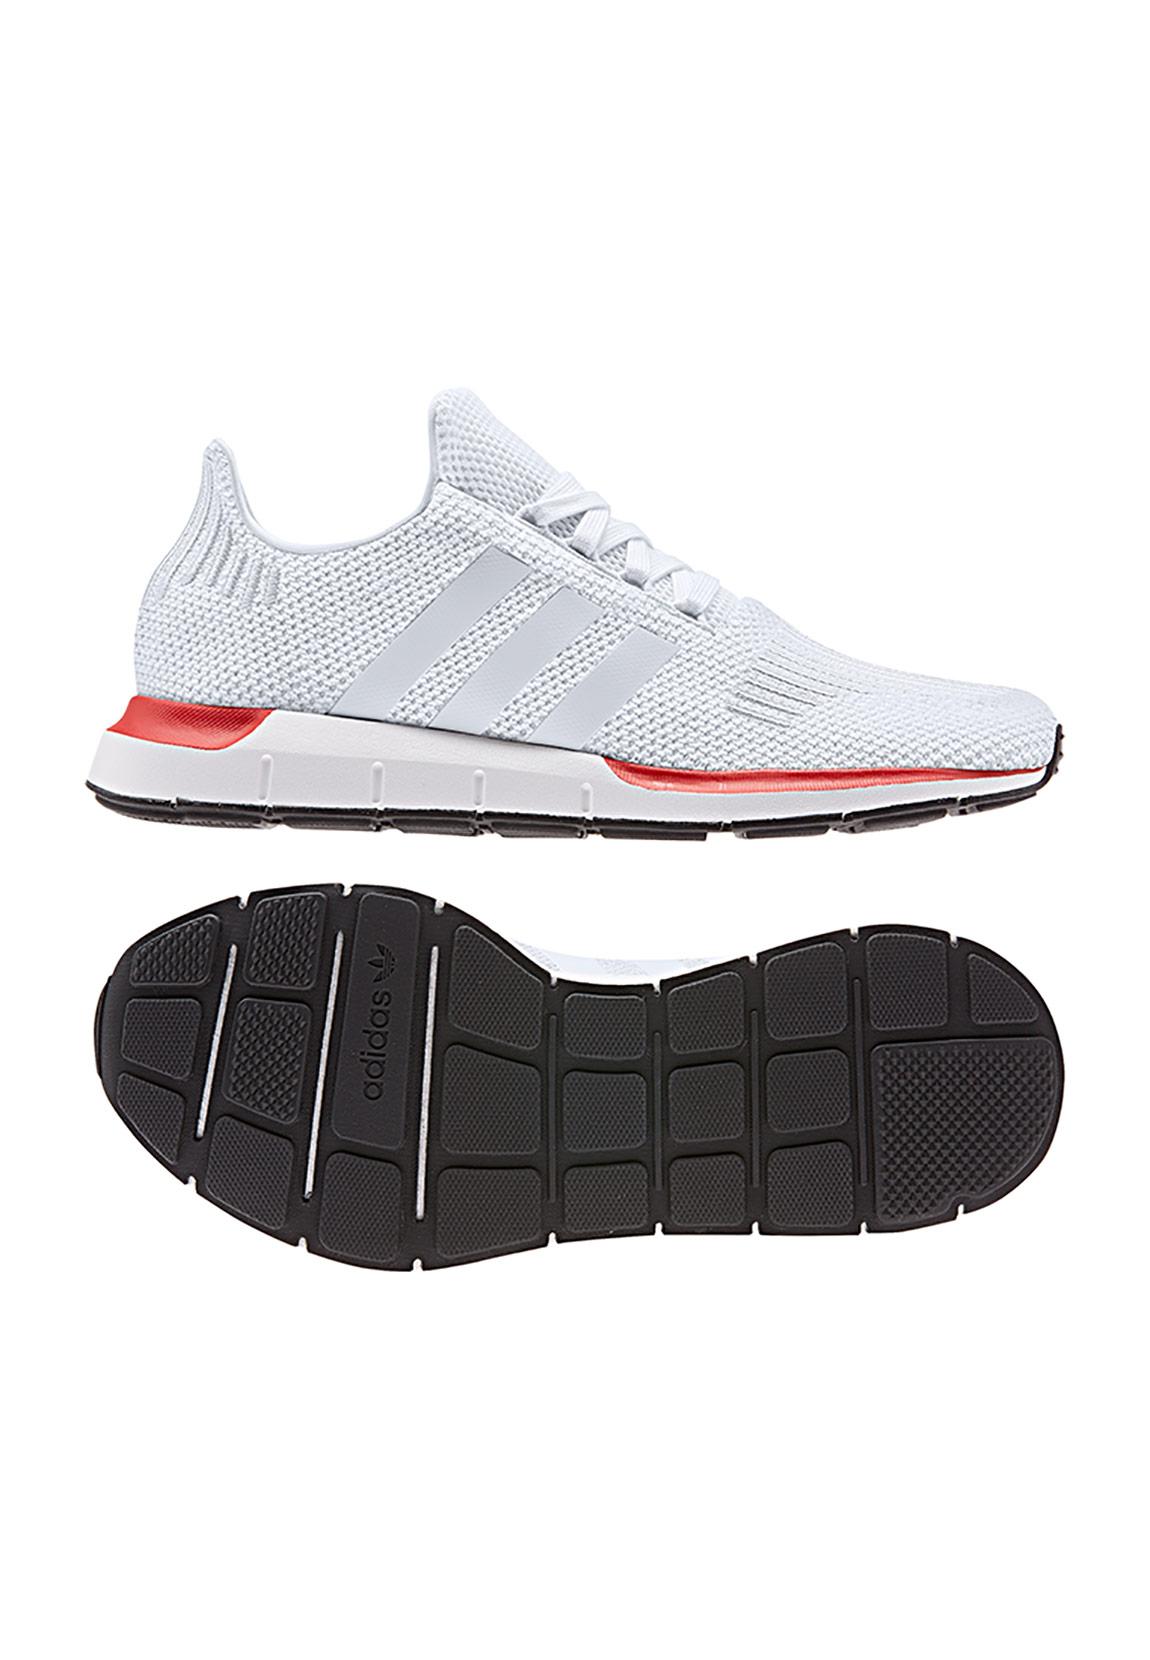 Details about Adidas Originals Trainers Swift Run EE4443 White